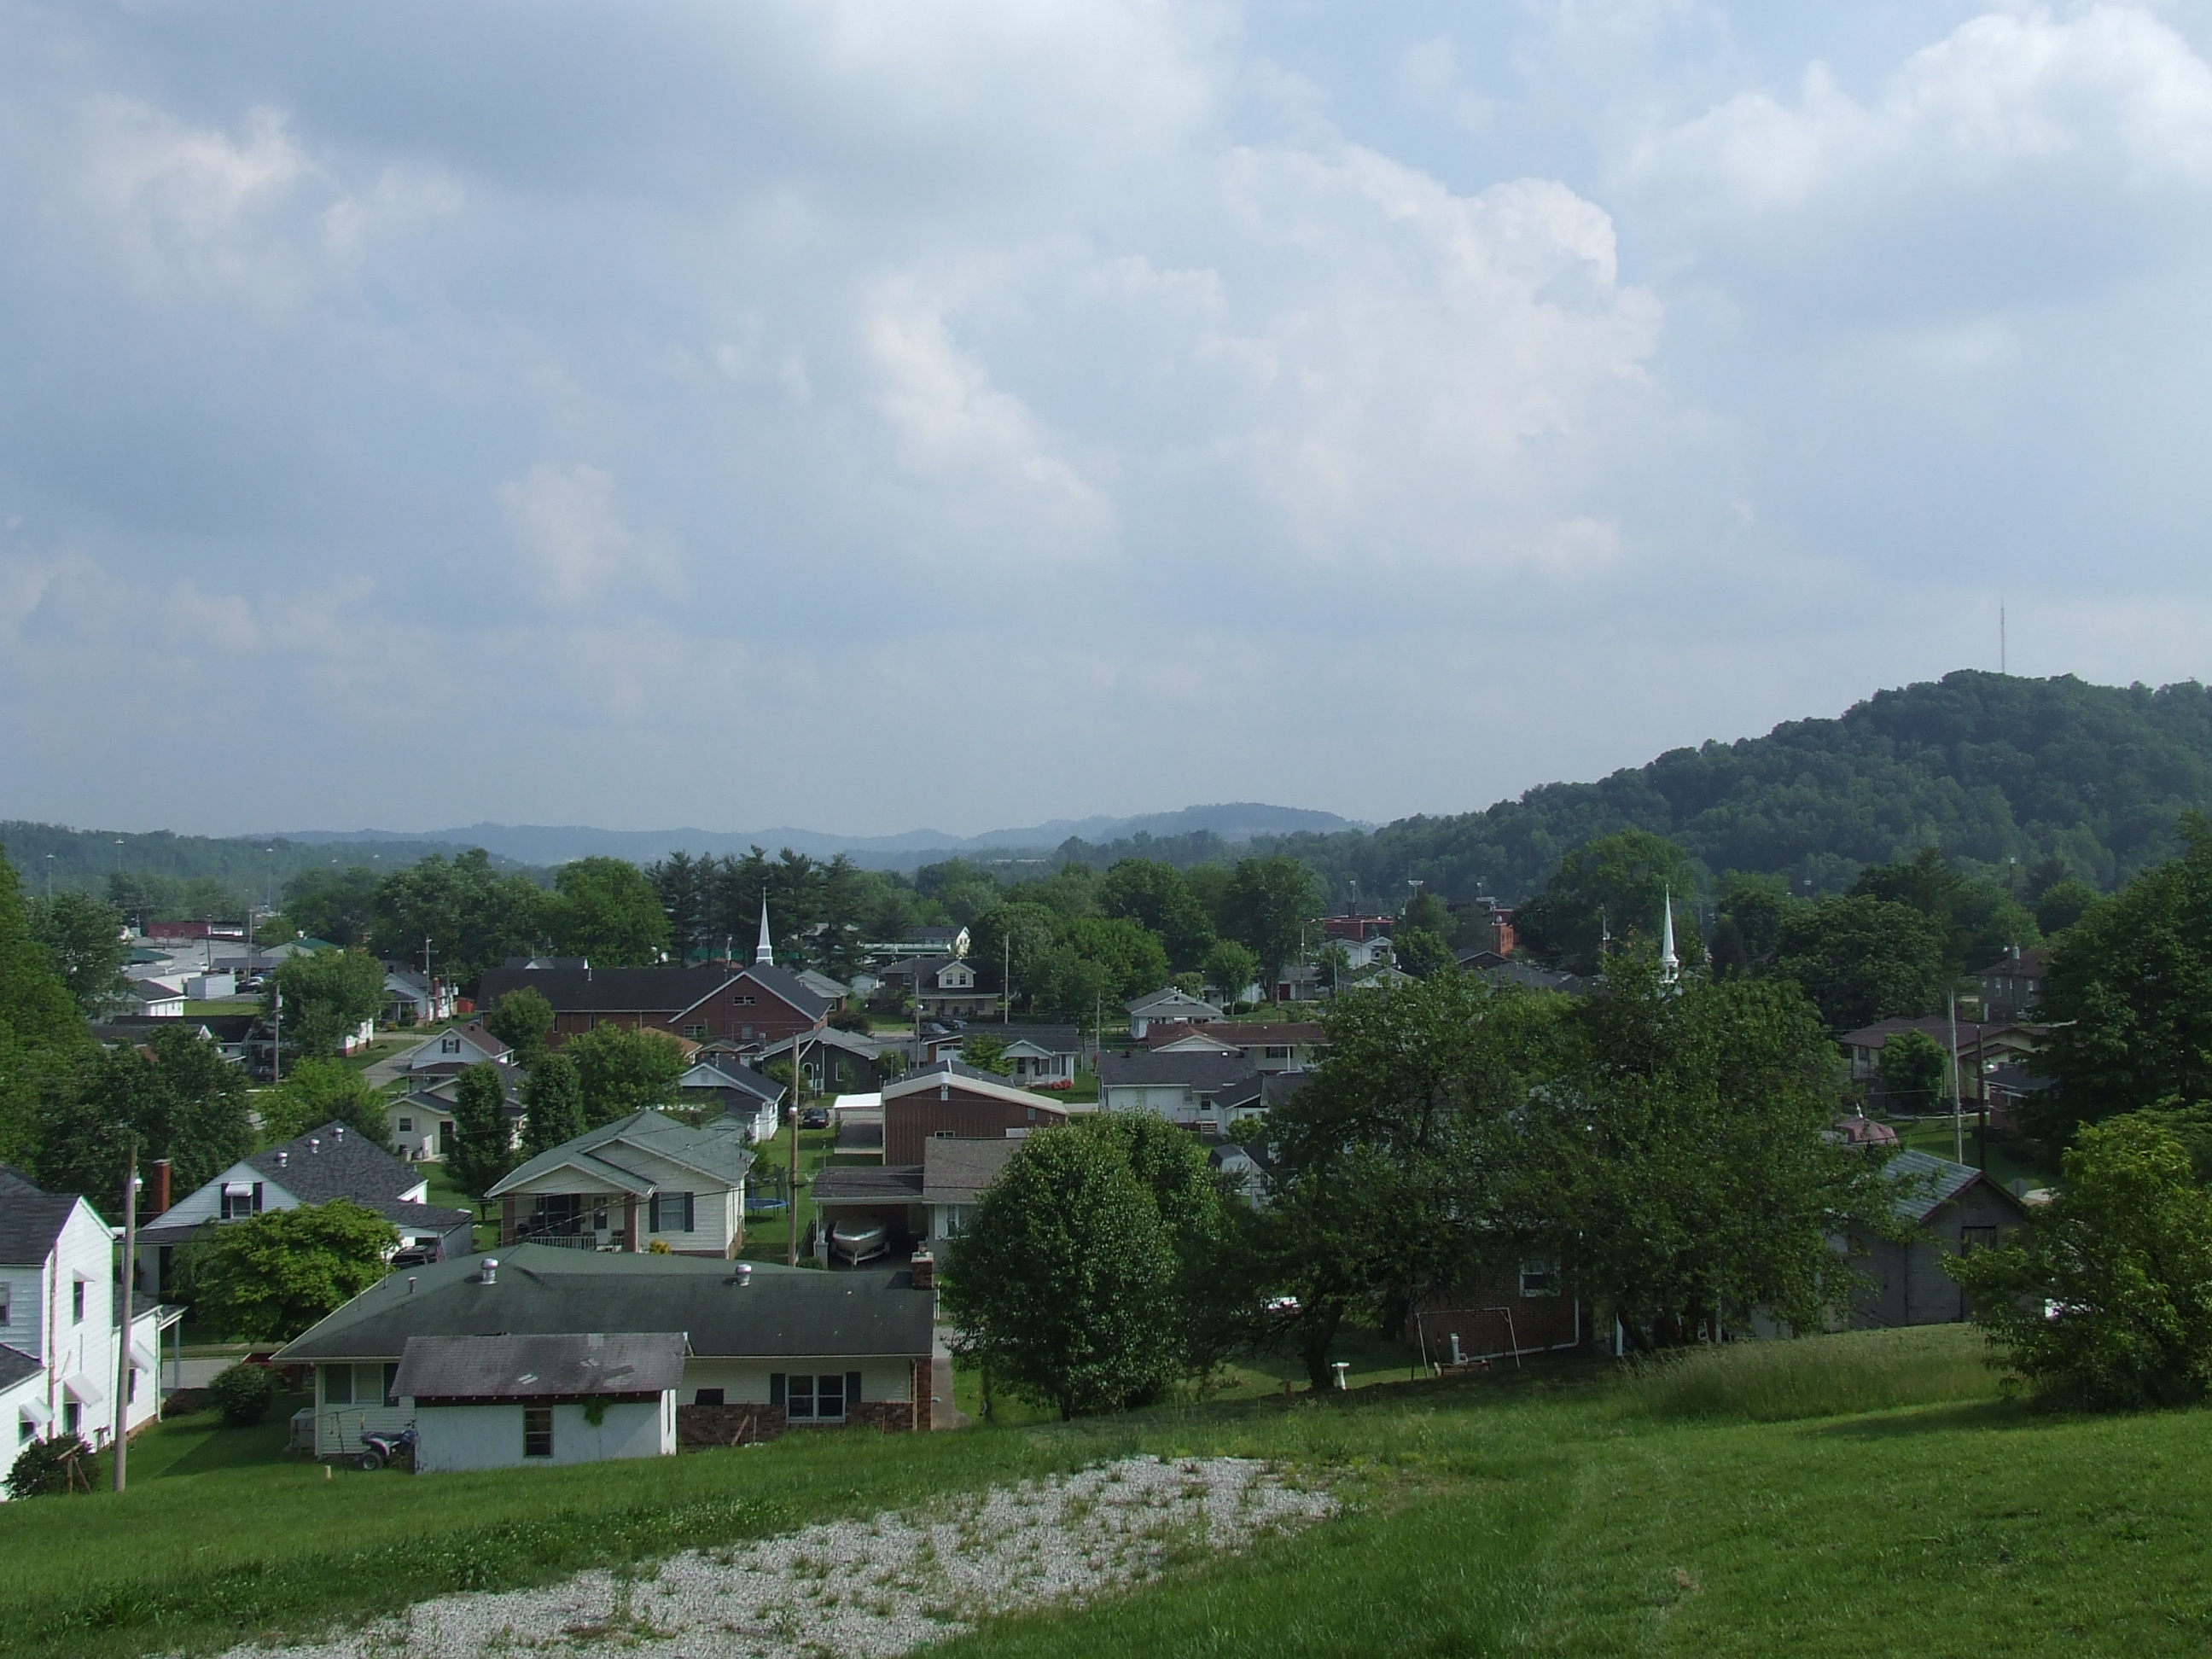 Corbin (Kentucky)